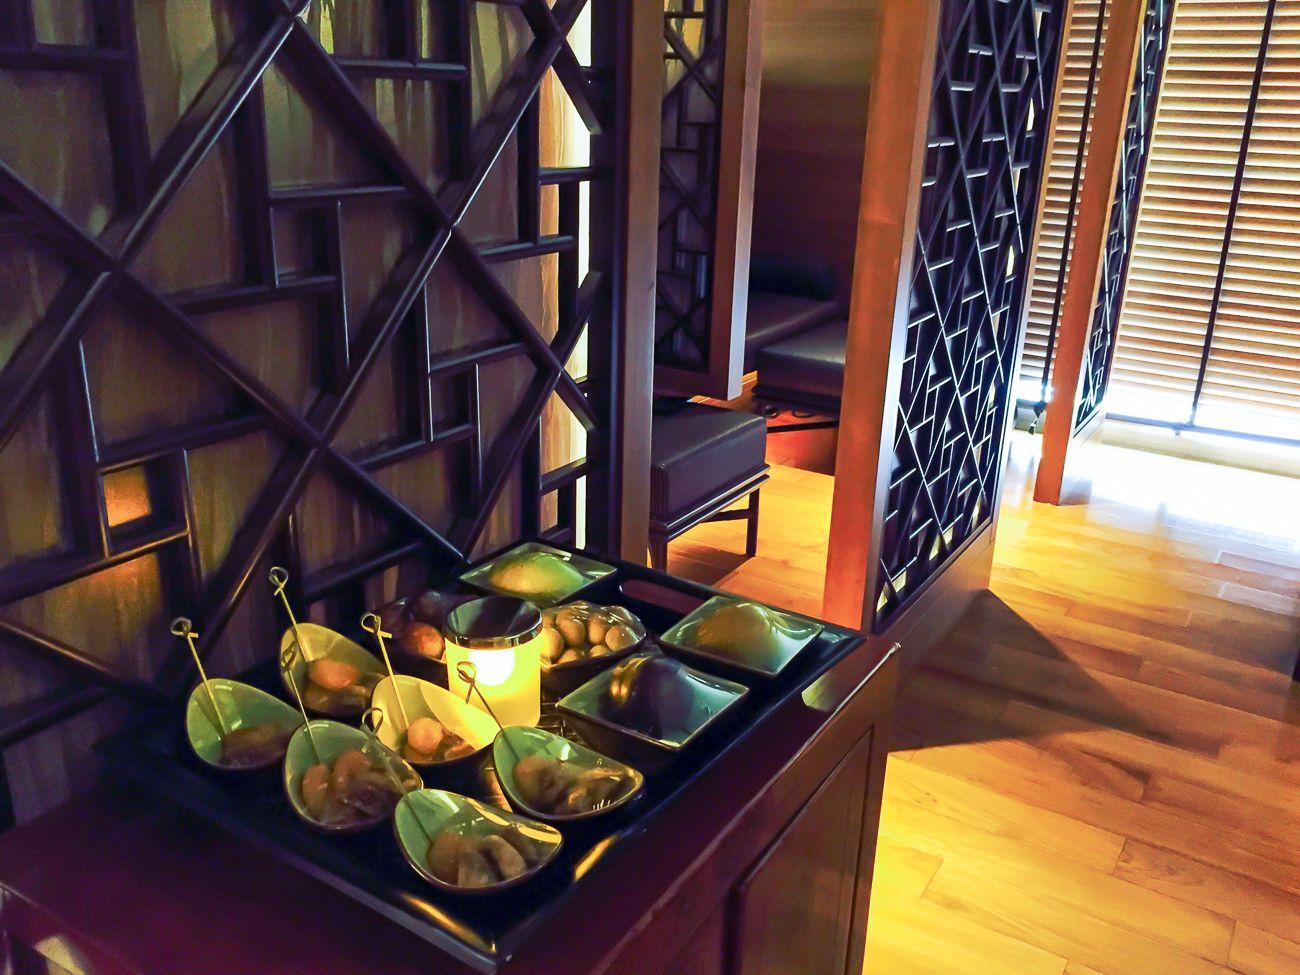 Snacks at The Mandarin Spa in Hong Kong that embrace the Chinese principles of Yin and Yang